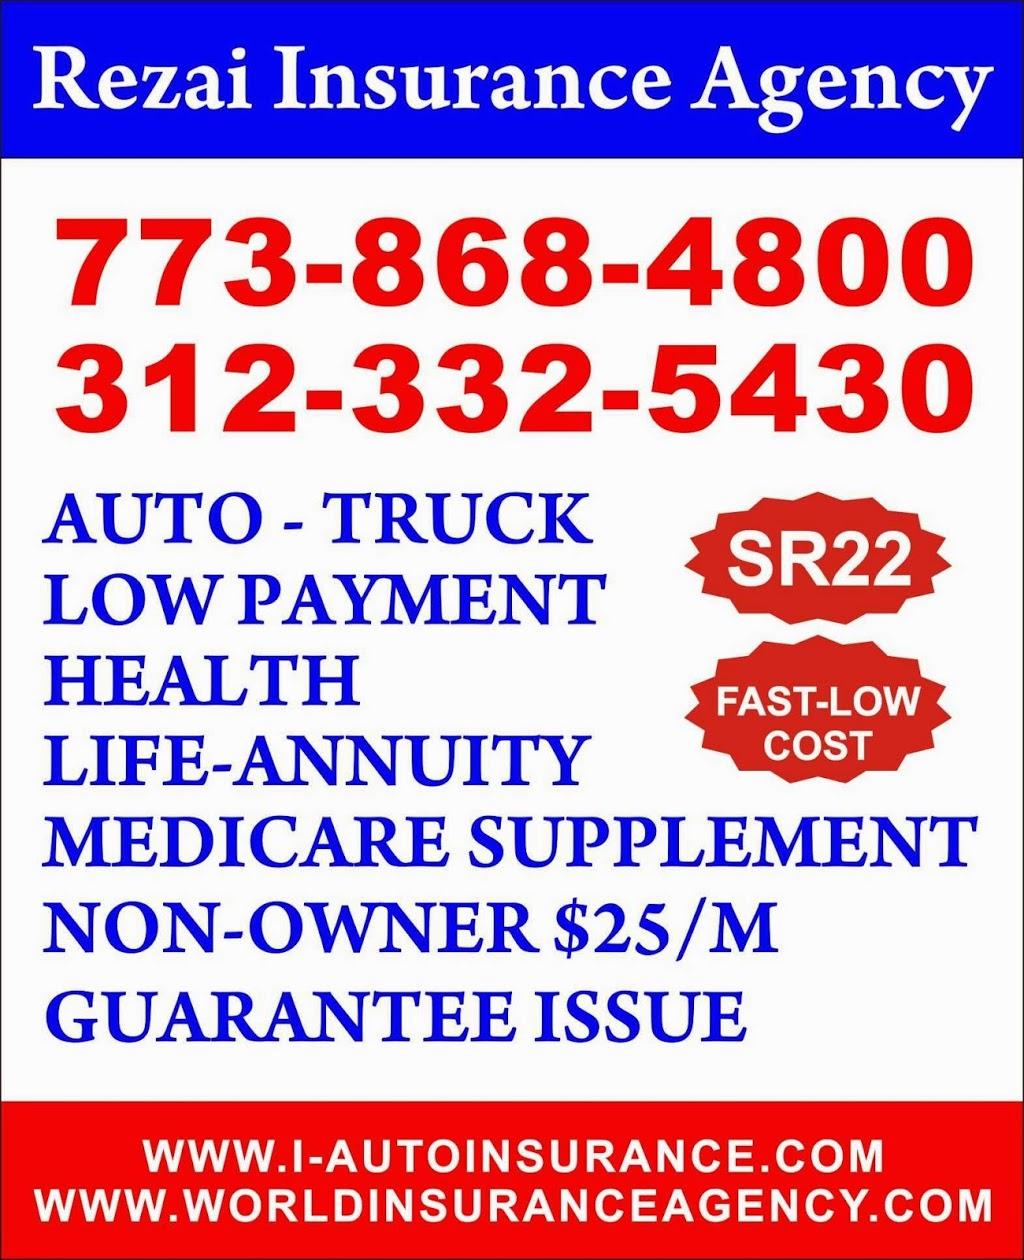 Rezai Insurance Agency | insurance agency | 441 W Fullerton Pkwy, Chicago, IL 60614, USA | 3123325430 OR +1 312-332-5430